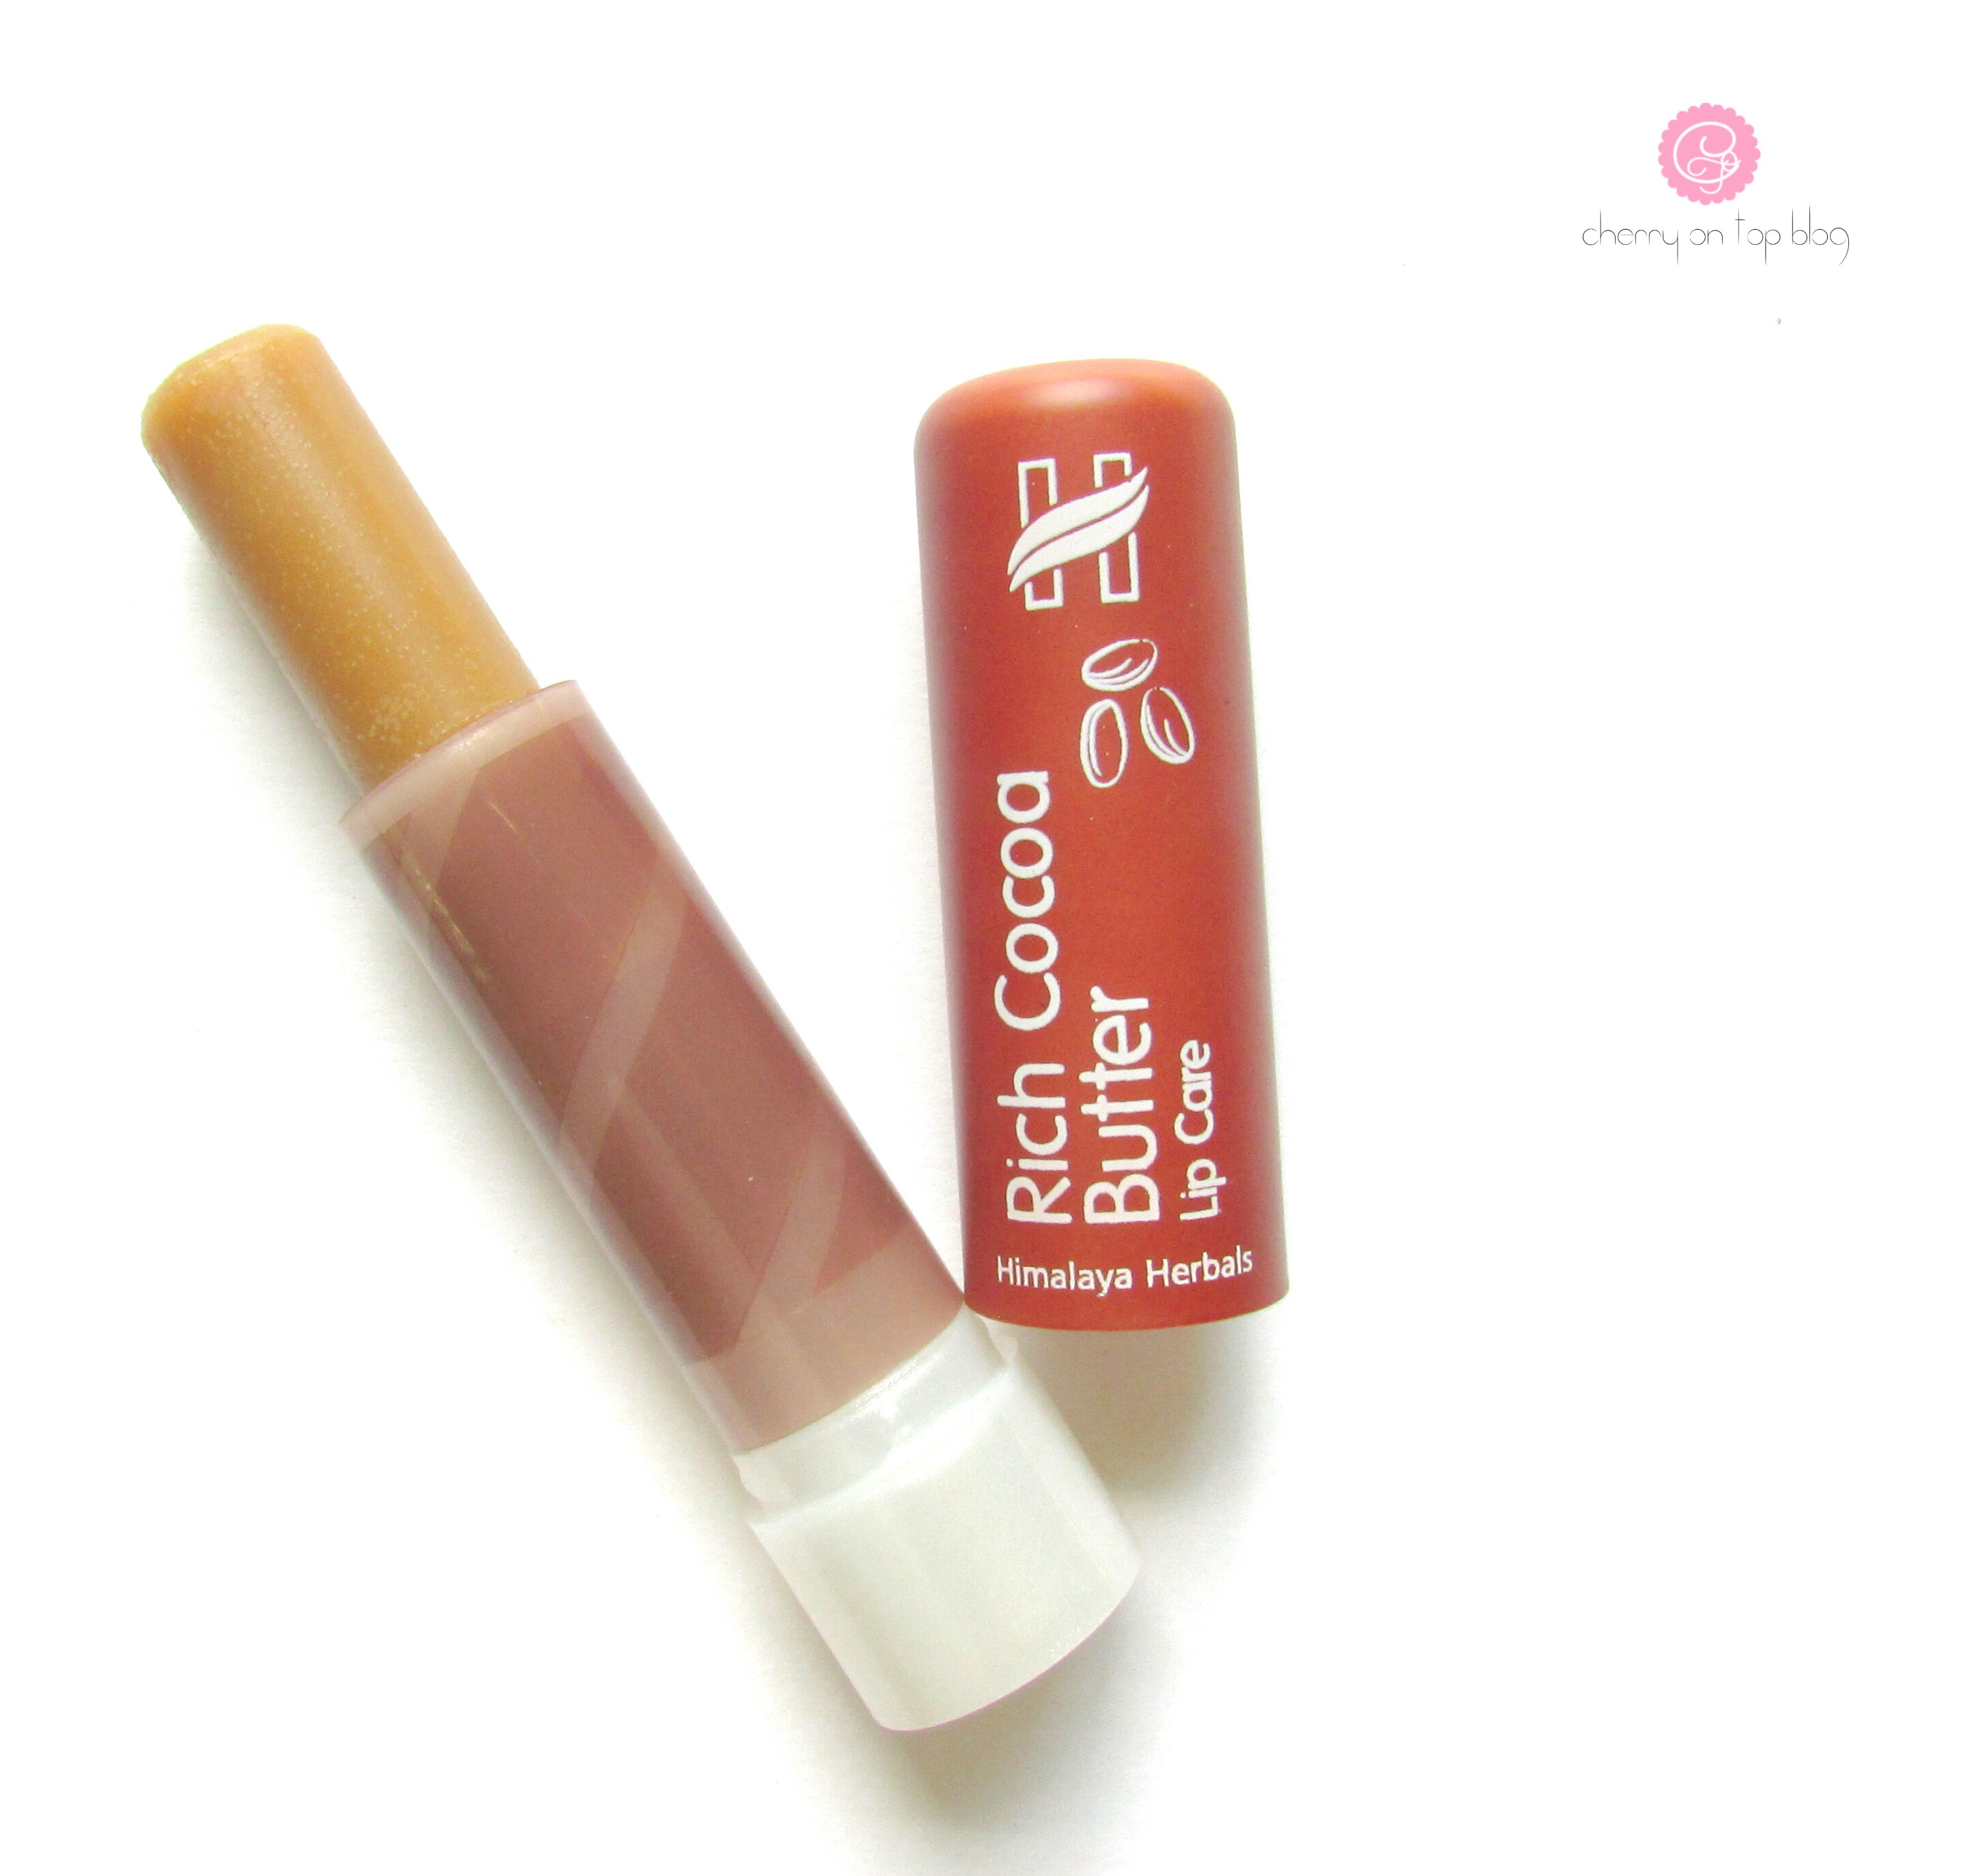 All New Himalaya Herbals Lip Care Lip Balms Review| cherryontopblog.com